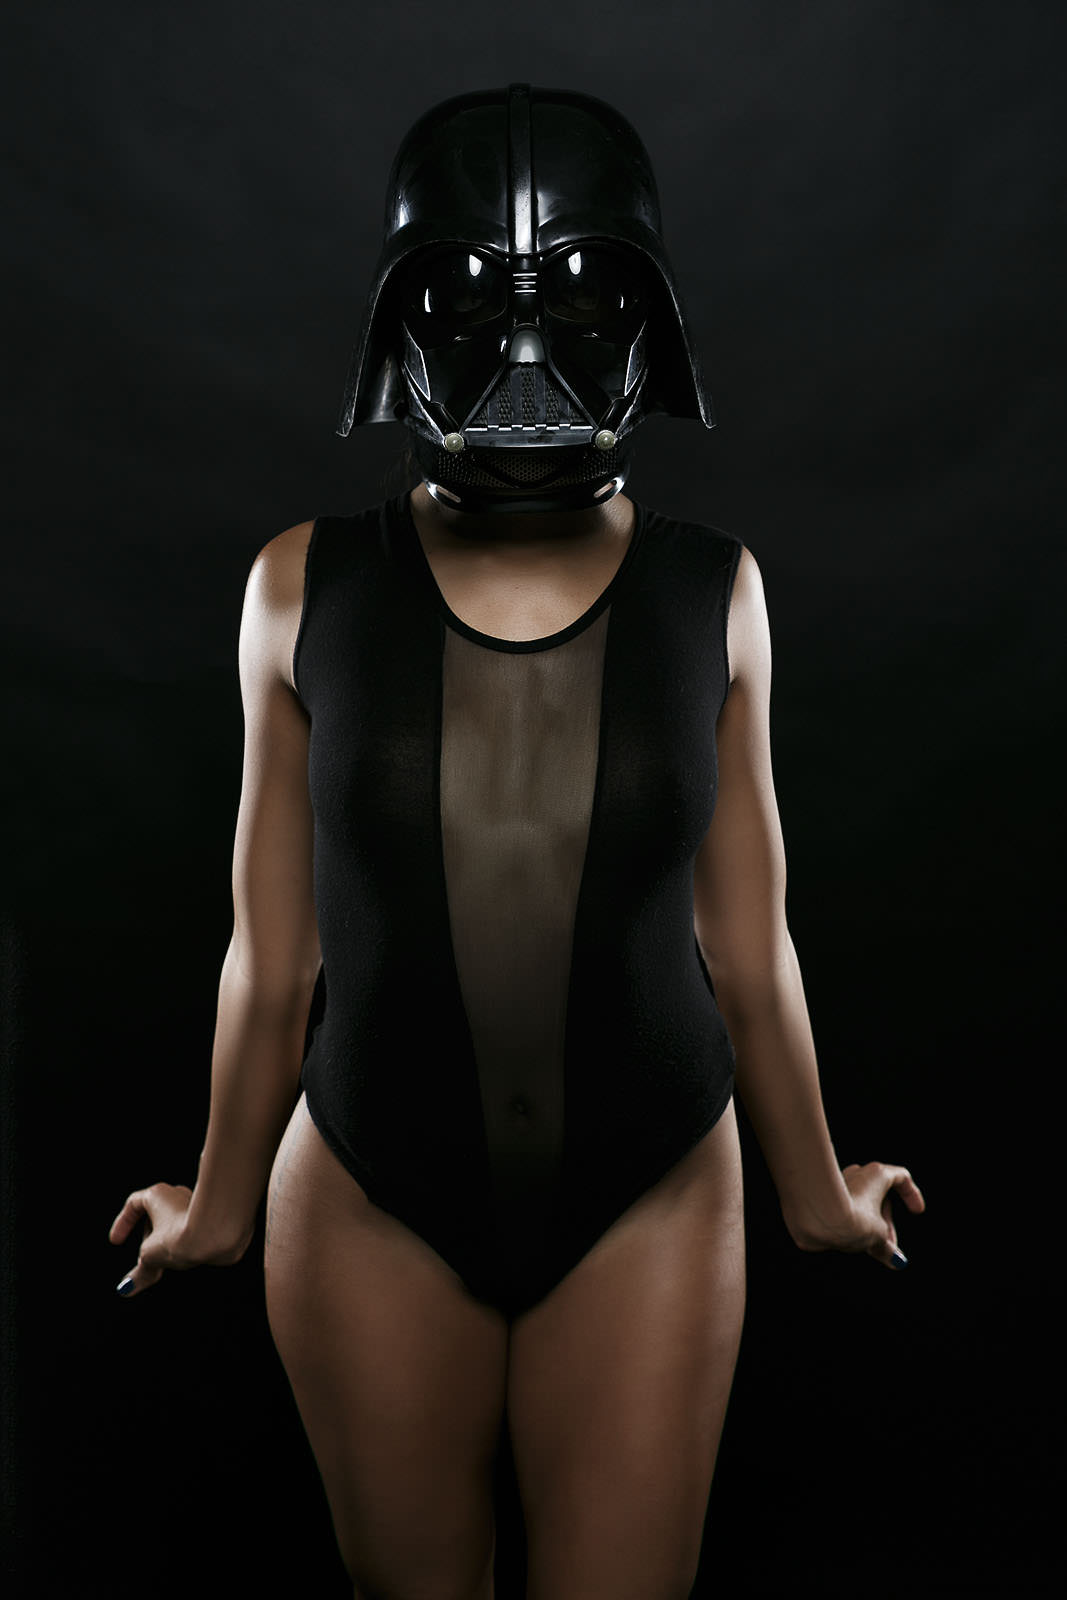 marcosvaldés|FOTÓGRAFO® commercial portrait photographer, starwars - darkside